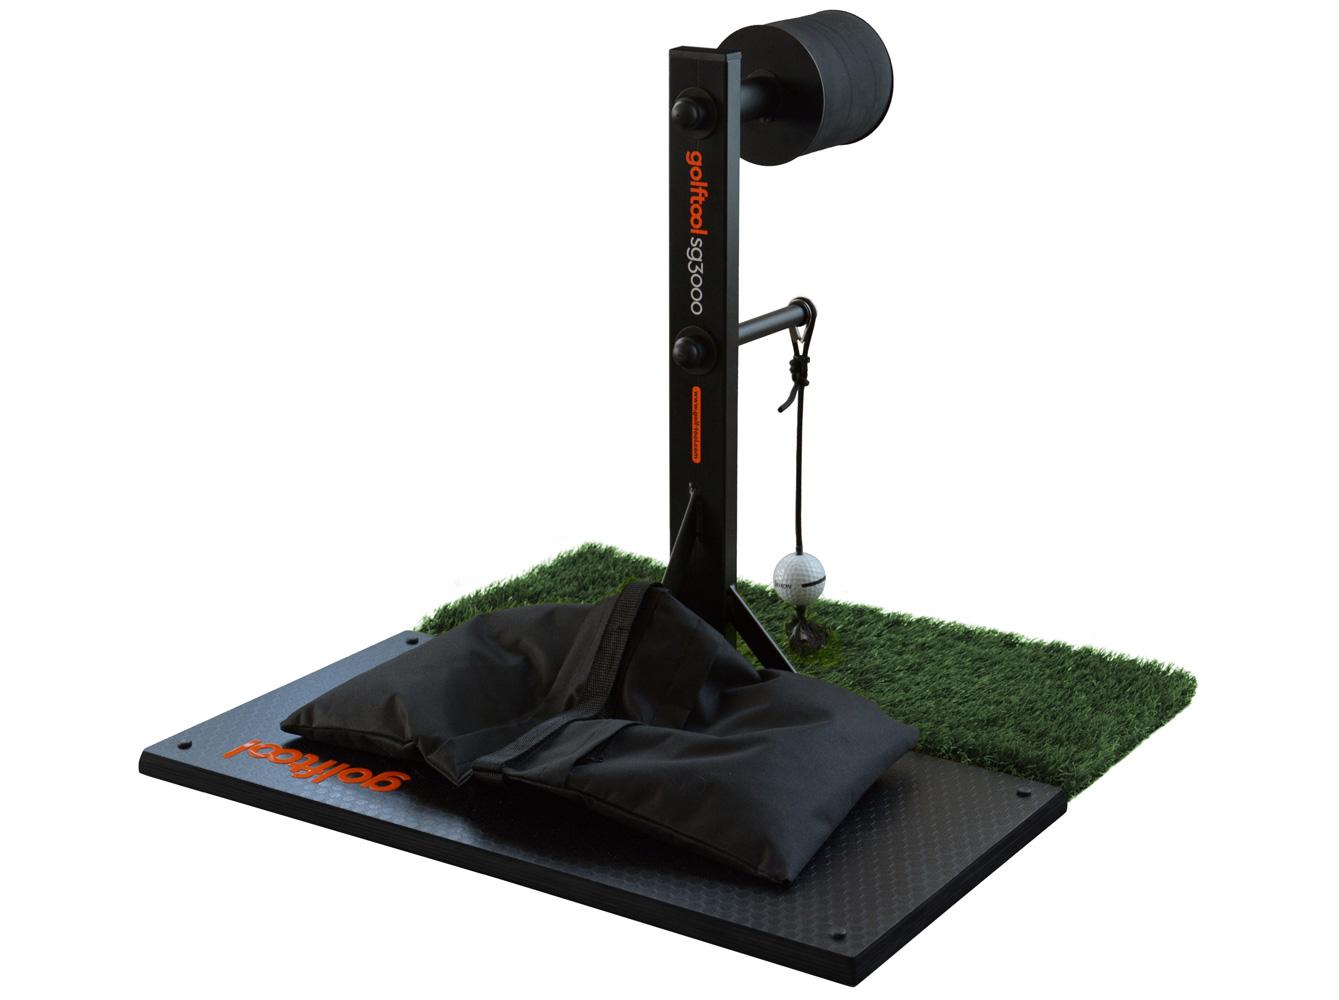 golftool sg3000